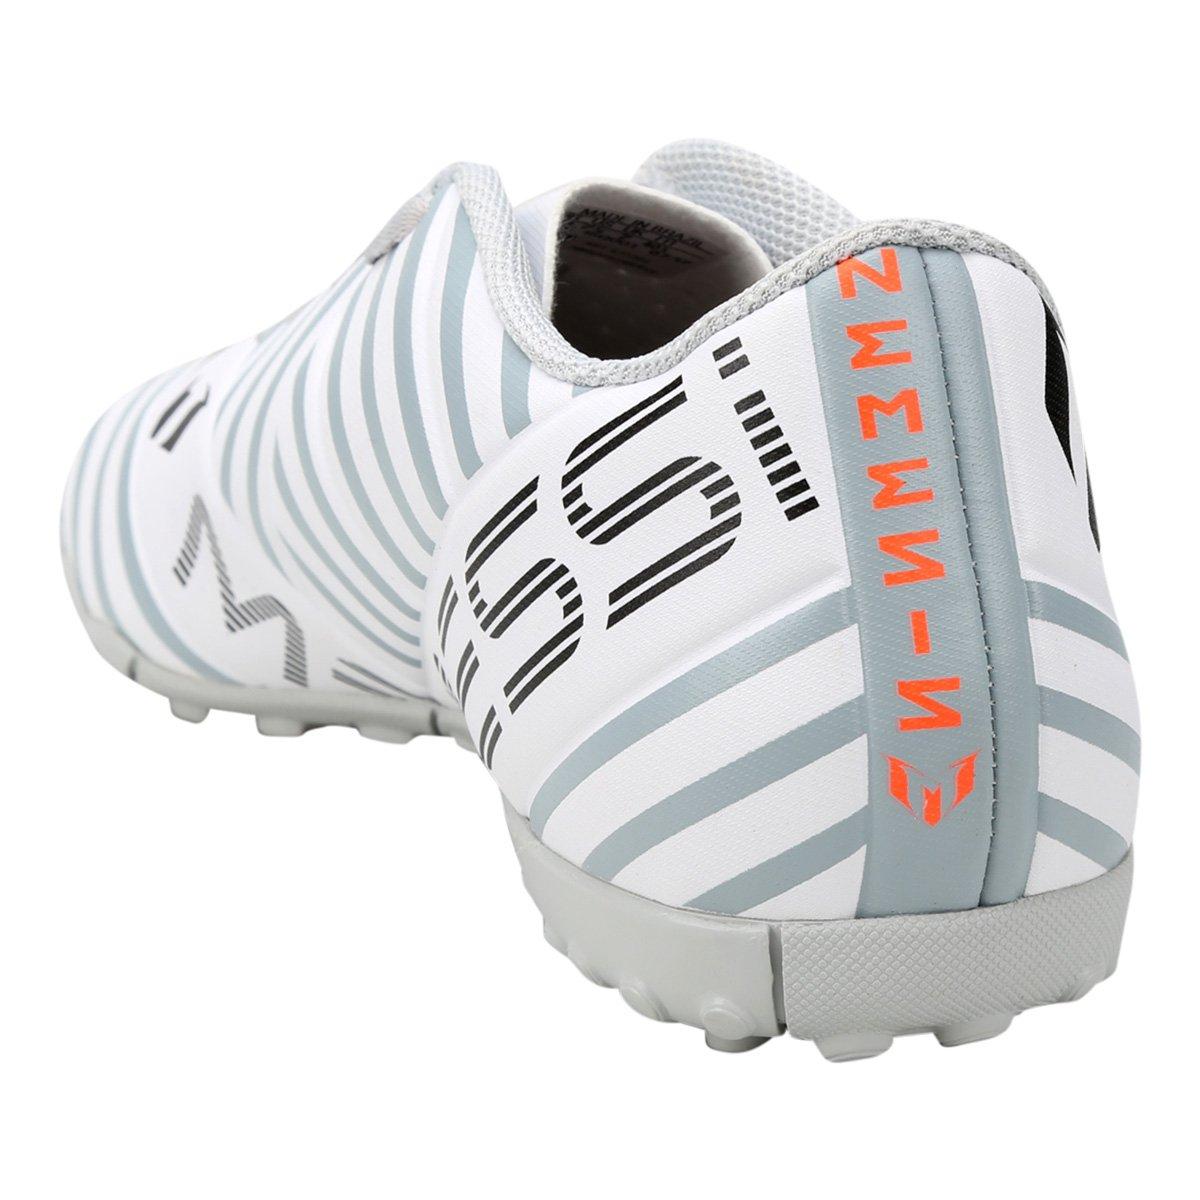 c288b85570 Chuteira Society Adidas Nemeziz Messi 17.4 TF - Compre Agora